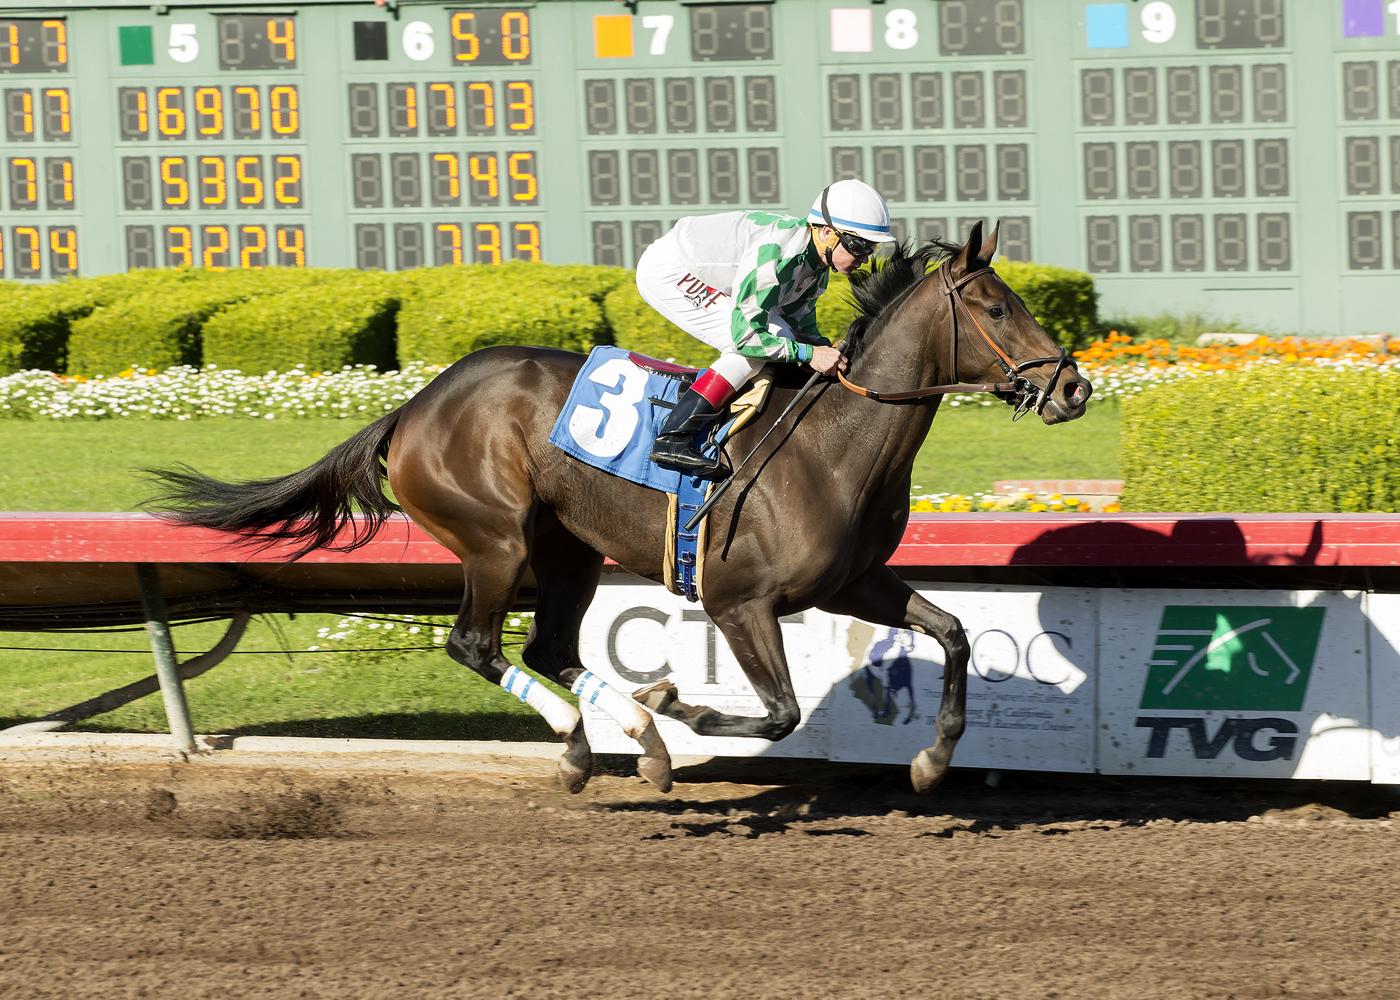 Joe Turner's Sircat Sally and jockey Drayden Van Dyke win the $100,000 Soviet Problem Stakes Saturday, Dec. 17, 2016, at Los Alamitos Race Course, in Cypress, Calif. (Benoit Photo via AP)